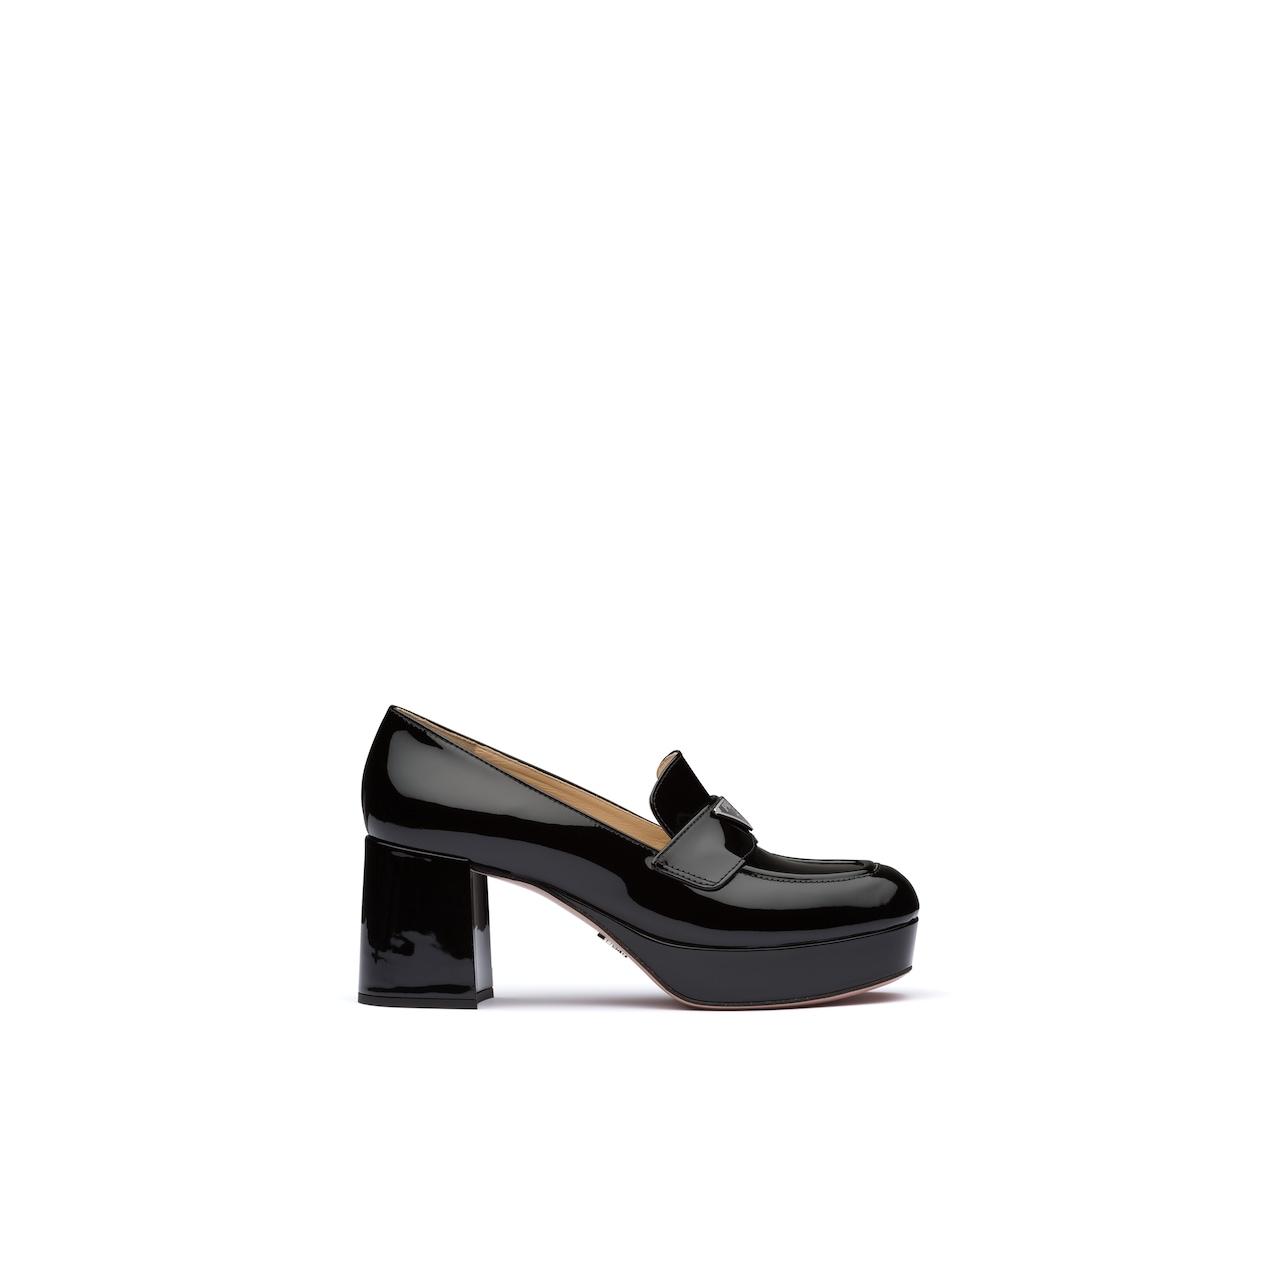 Prada 漆皮厚底乐福鞋 2